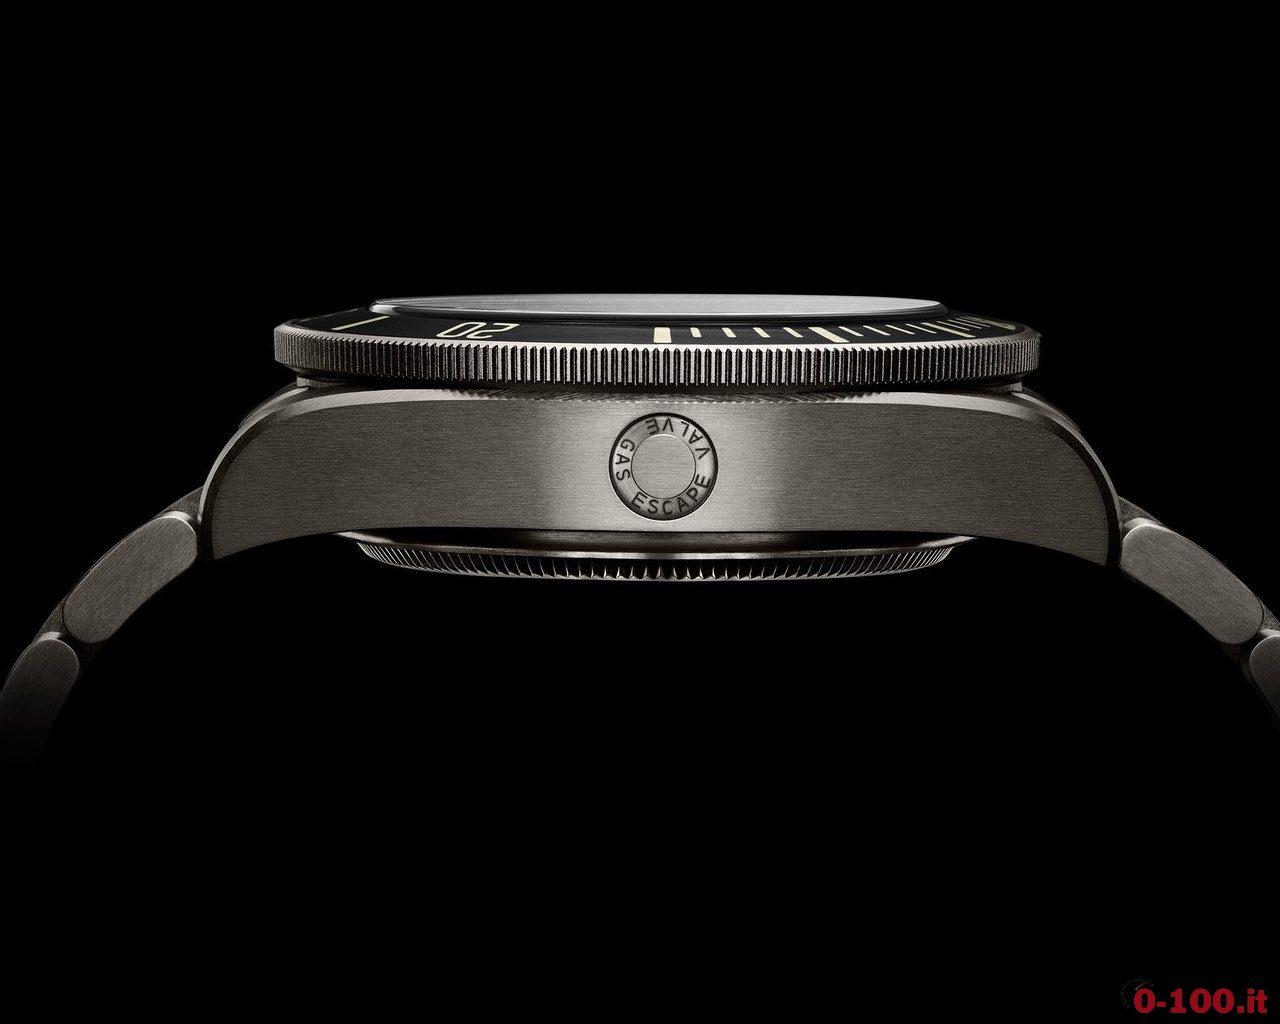 tudor-pelagos-lhd-left-handed-500-meter-diver-watch-prezzo-price_0-1004